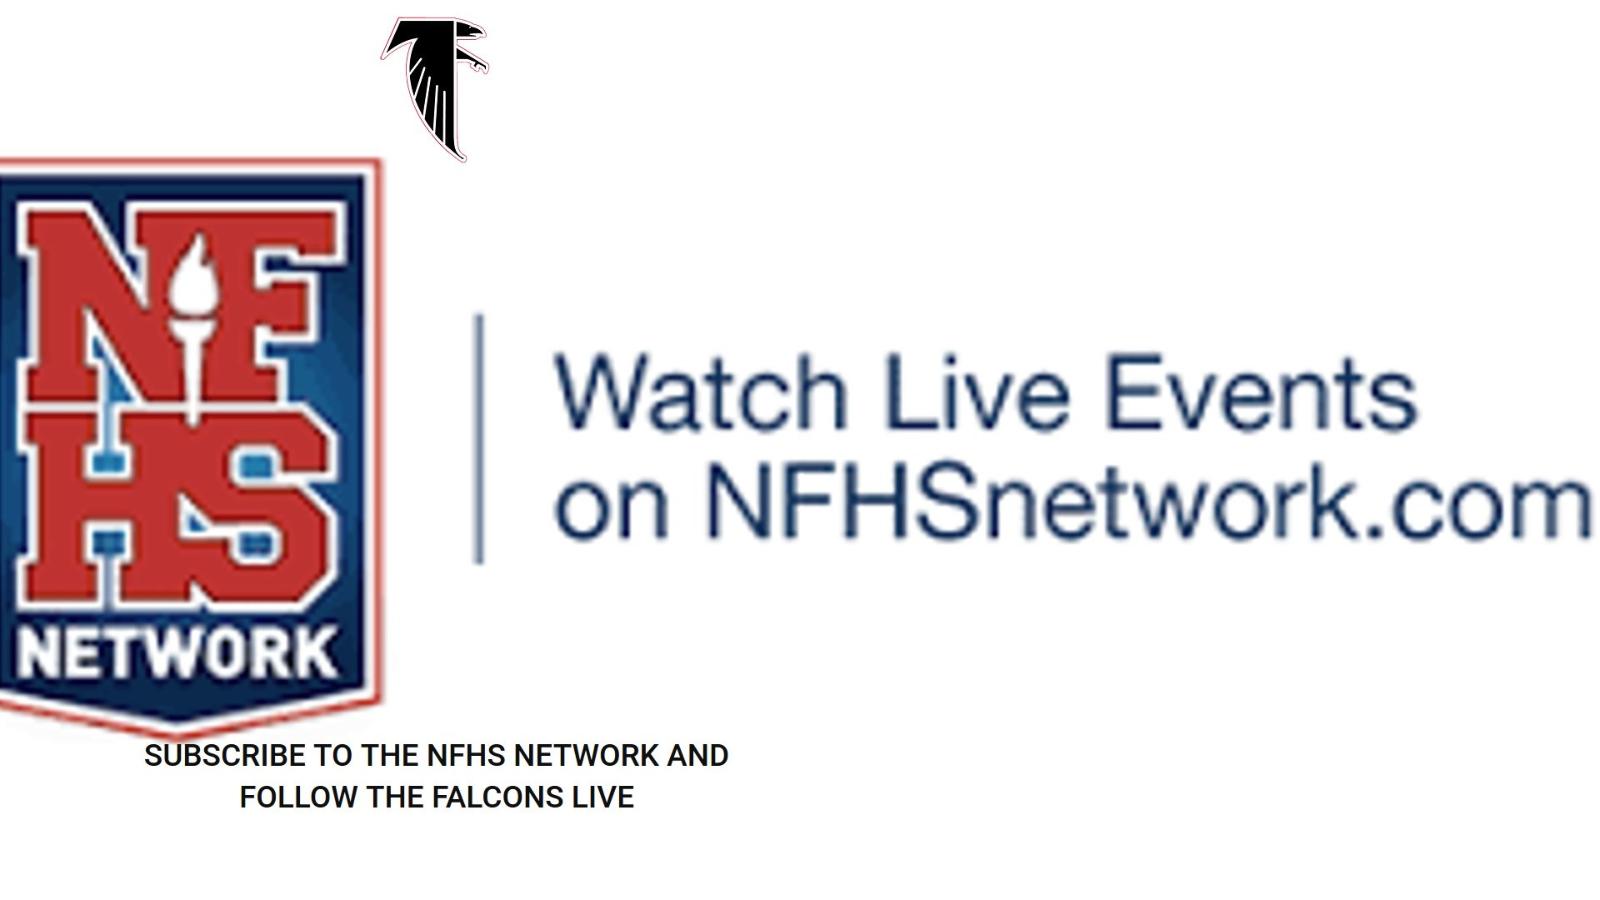 Live Stream all Firelands High School Home Games